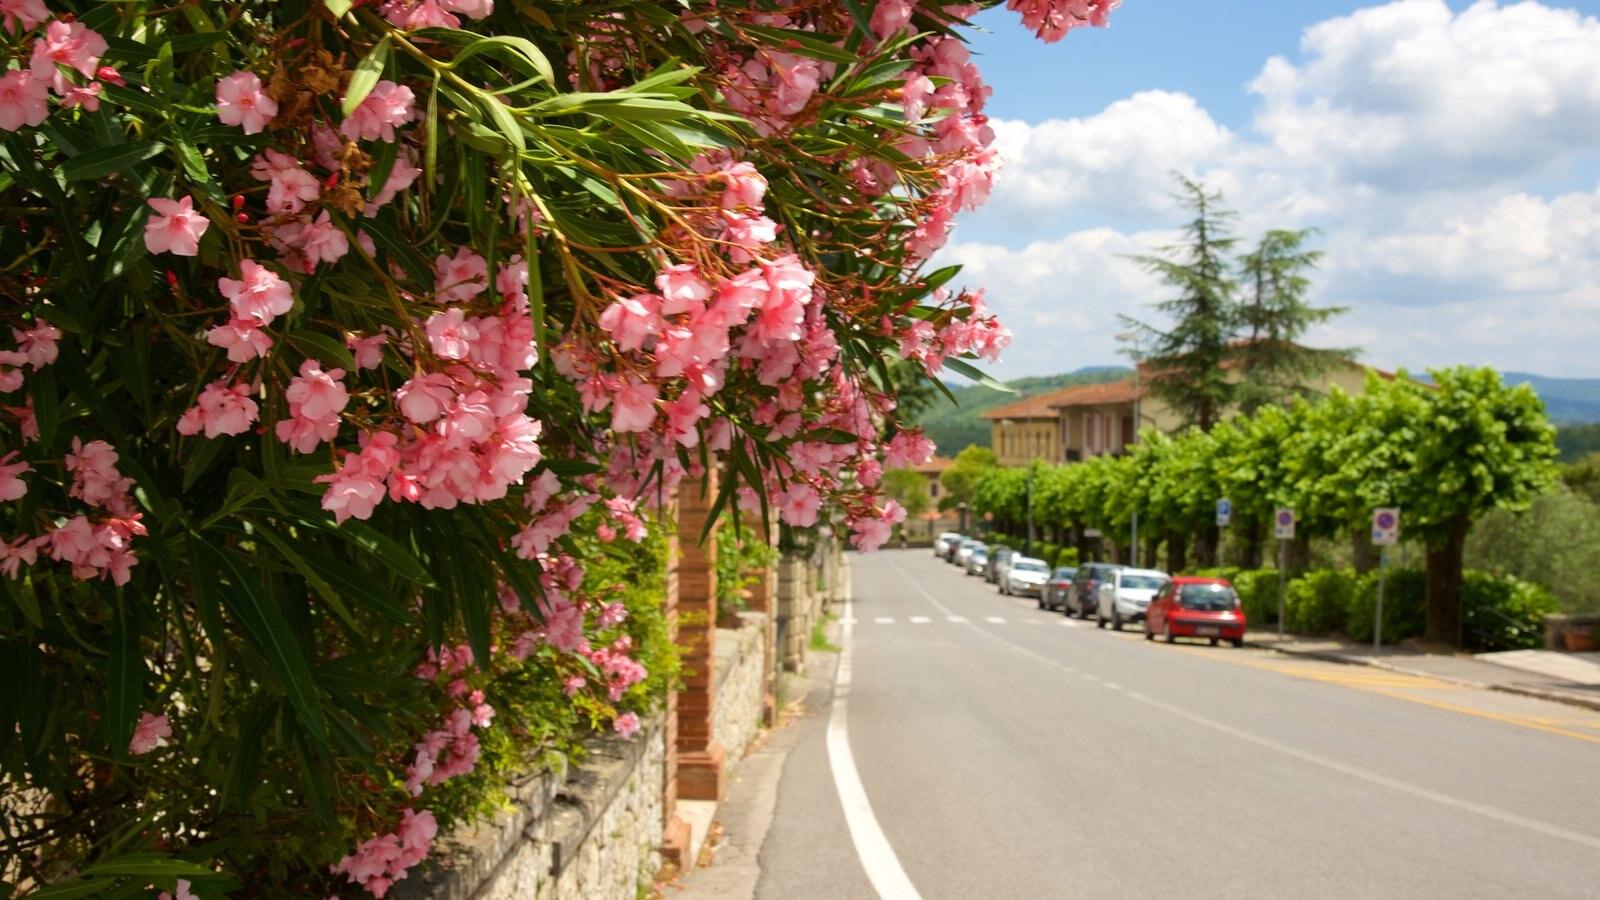 Radda in Chianti which includes flowers